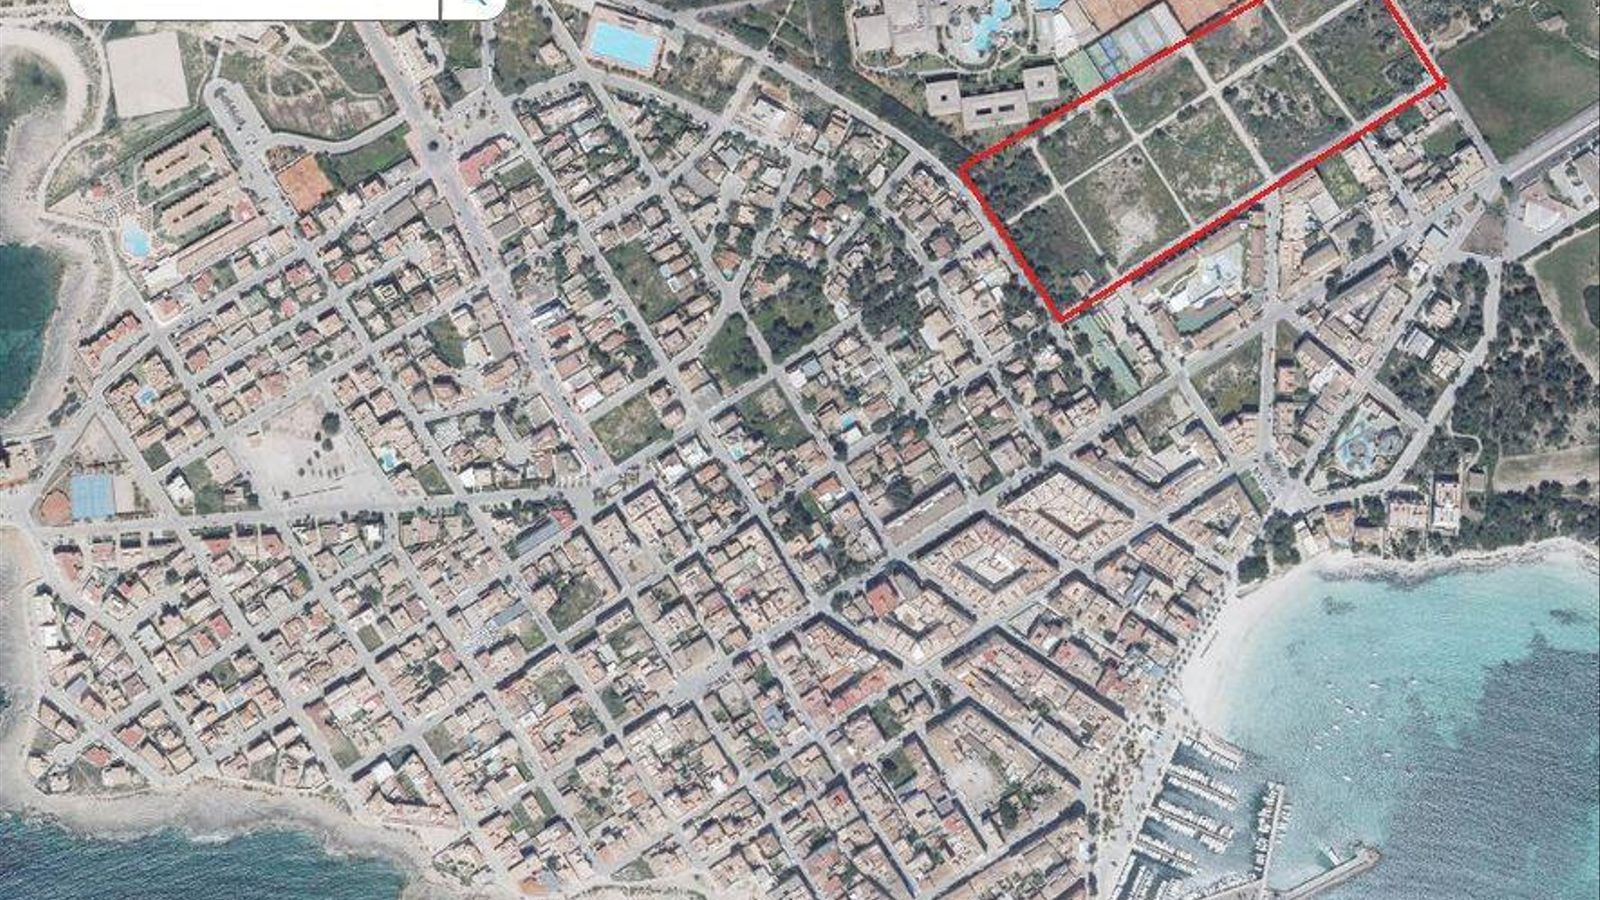 Imatge aèria de la zona que es vol construir.